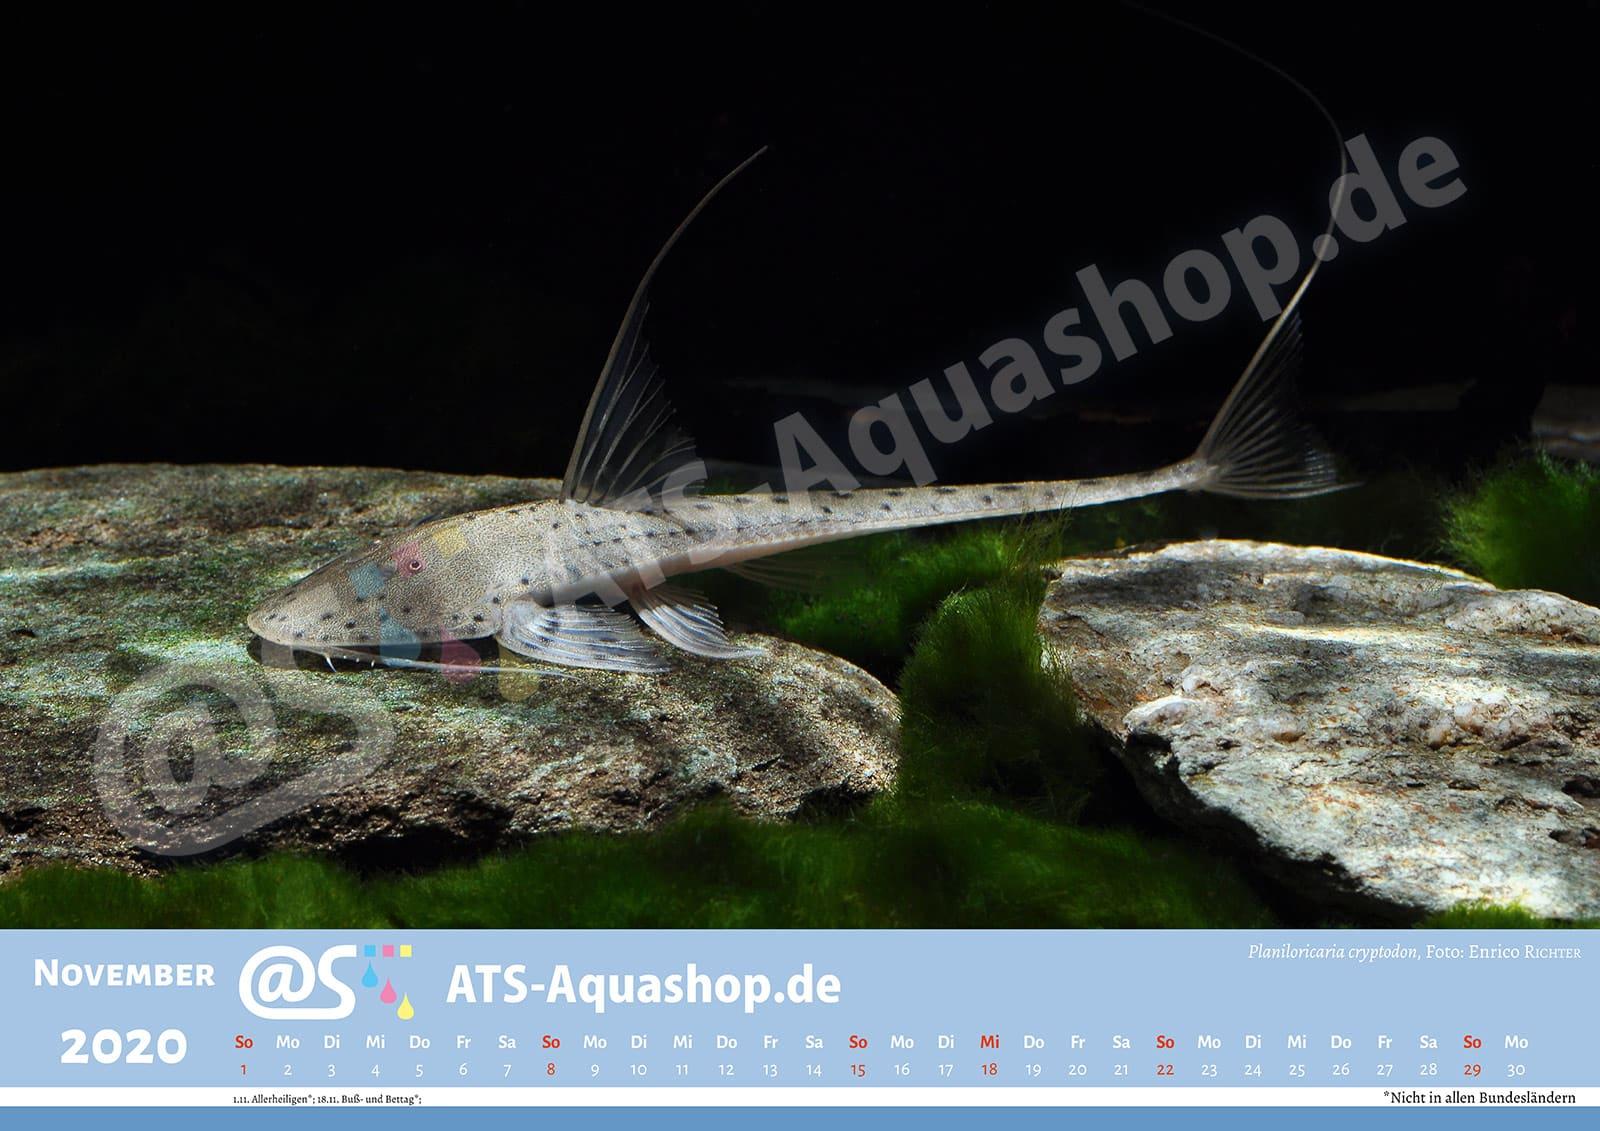 Foto Jahreskalender 2020 DIN A3: Planiloricaria cryptodon